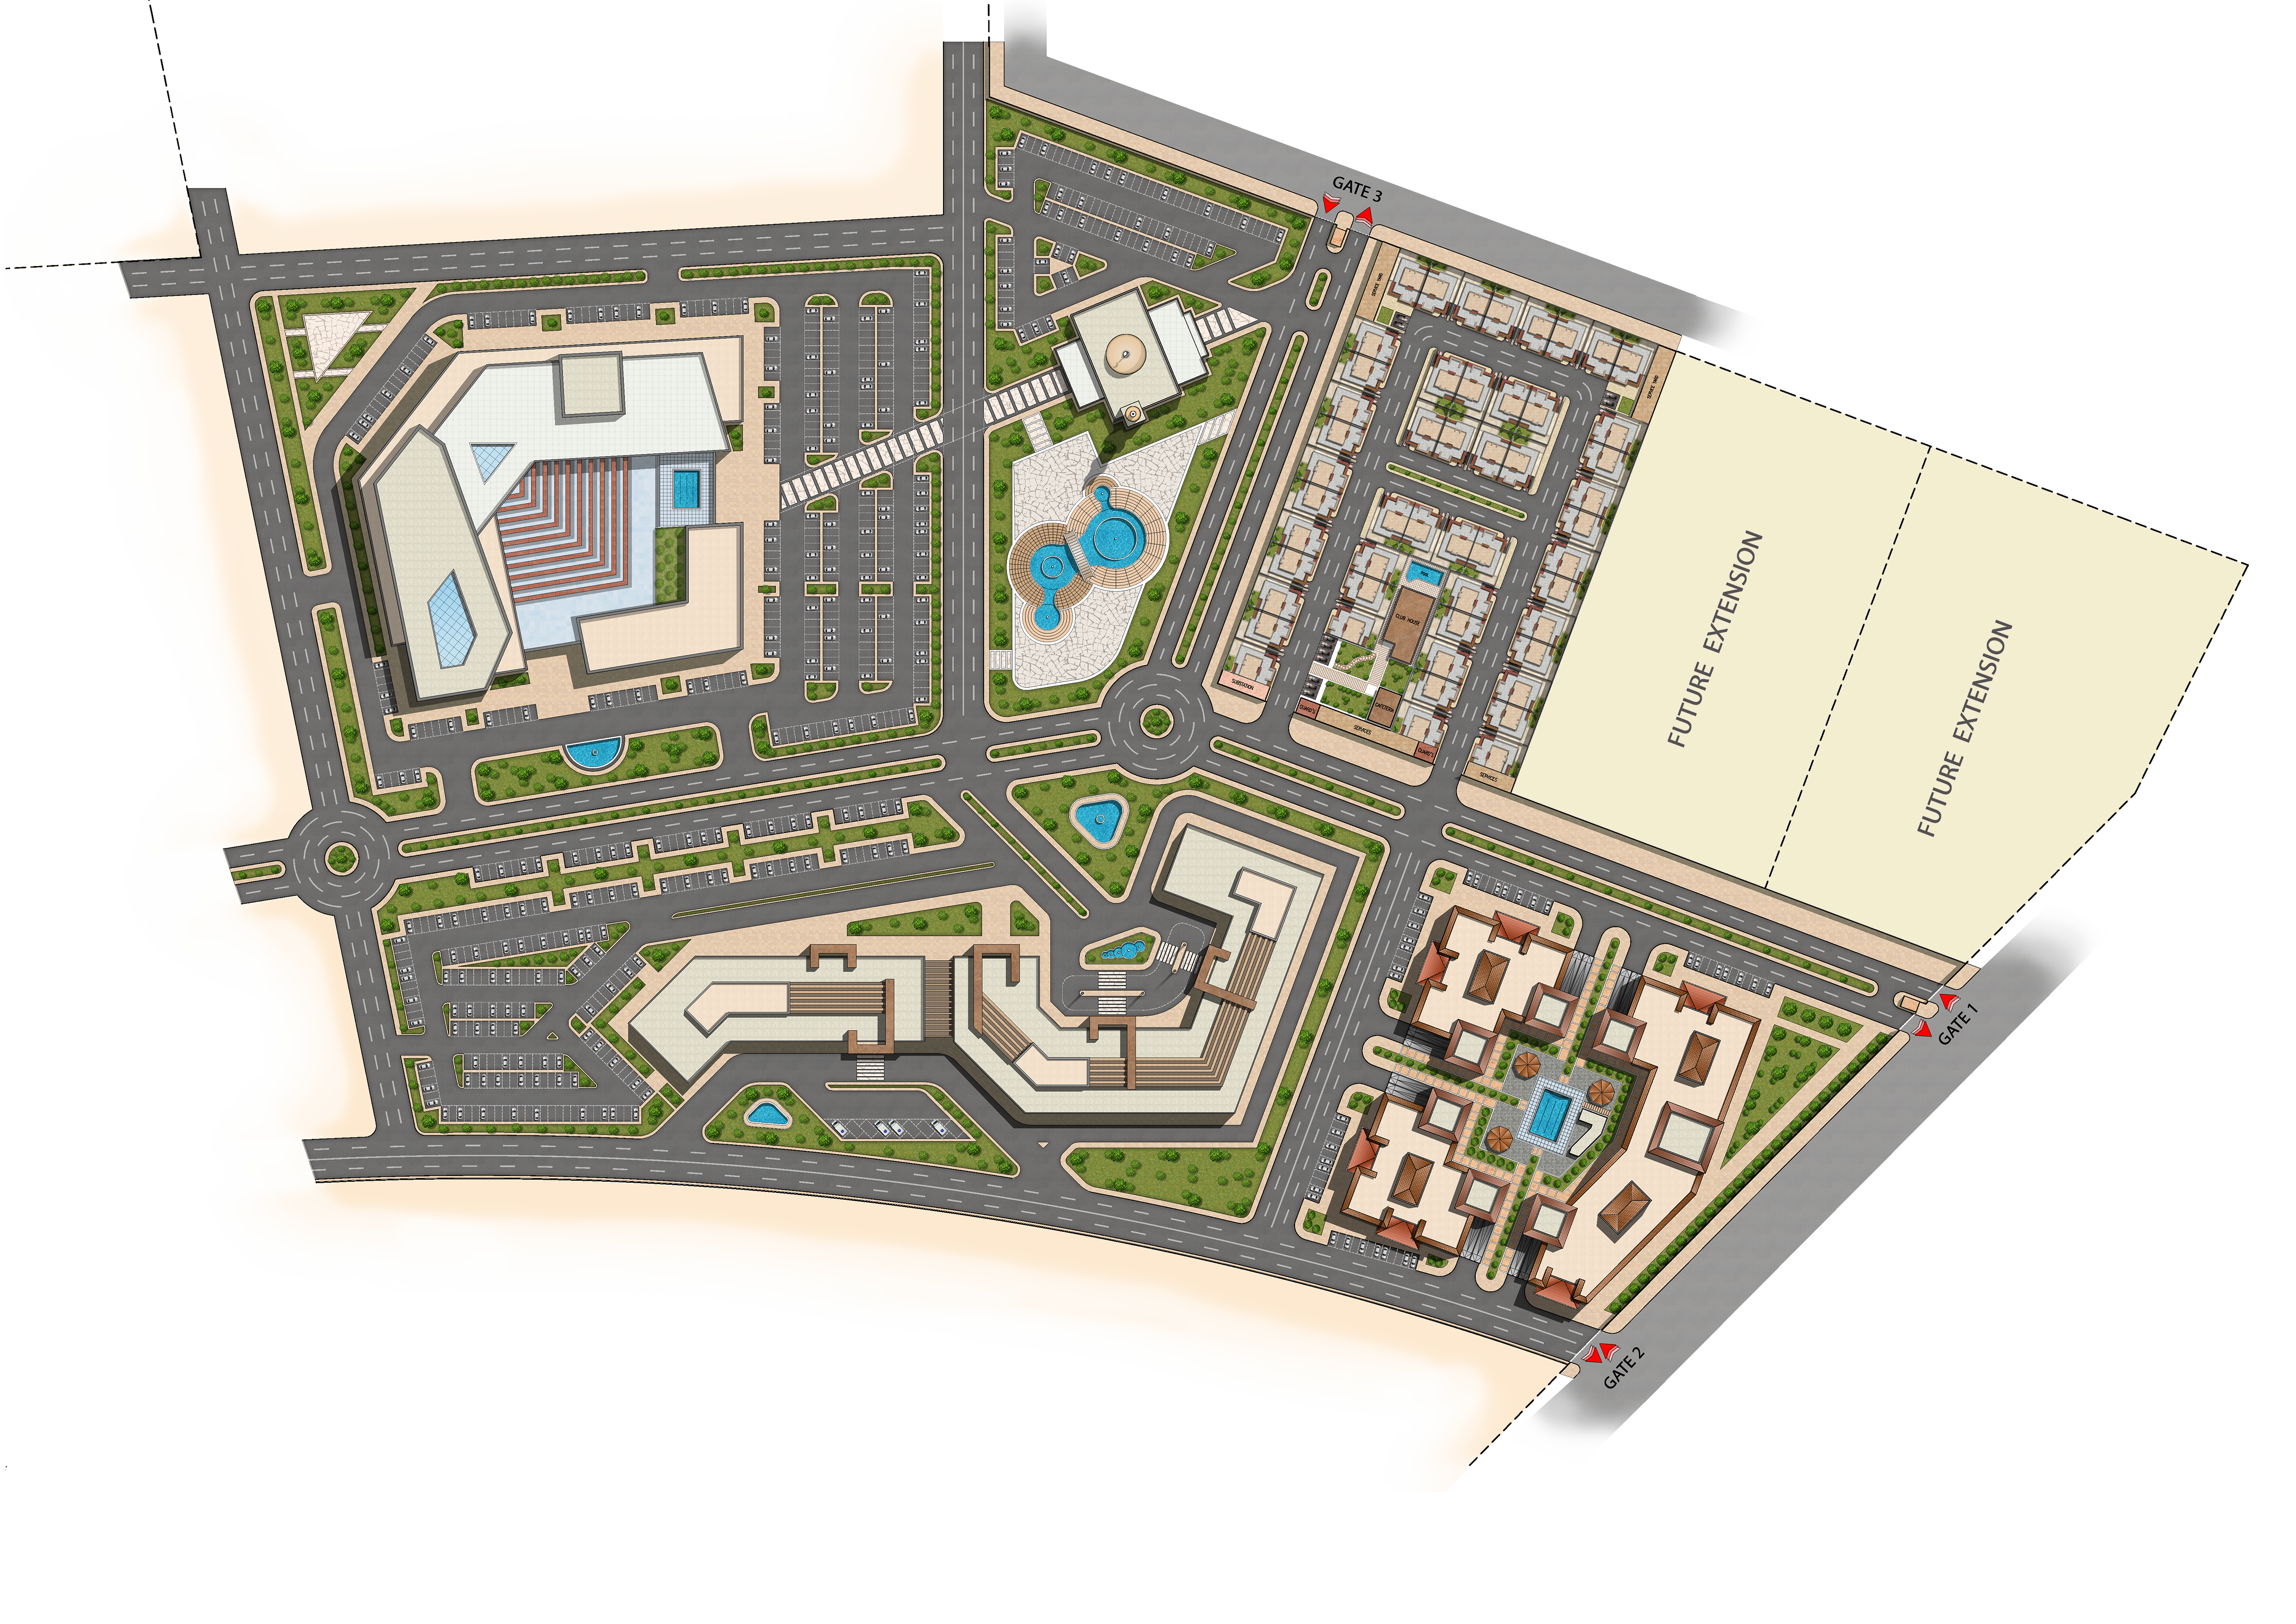 Sheikh Hassan Bin Khalid Al Thani - Landuse Design